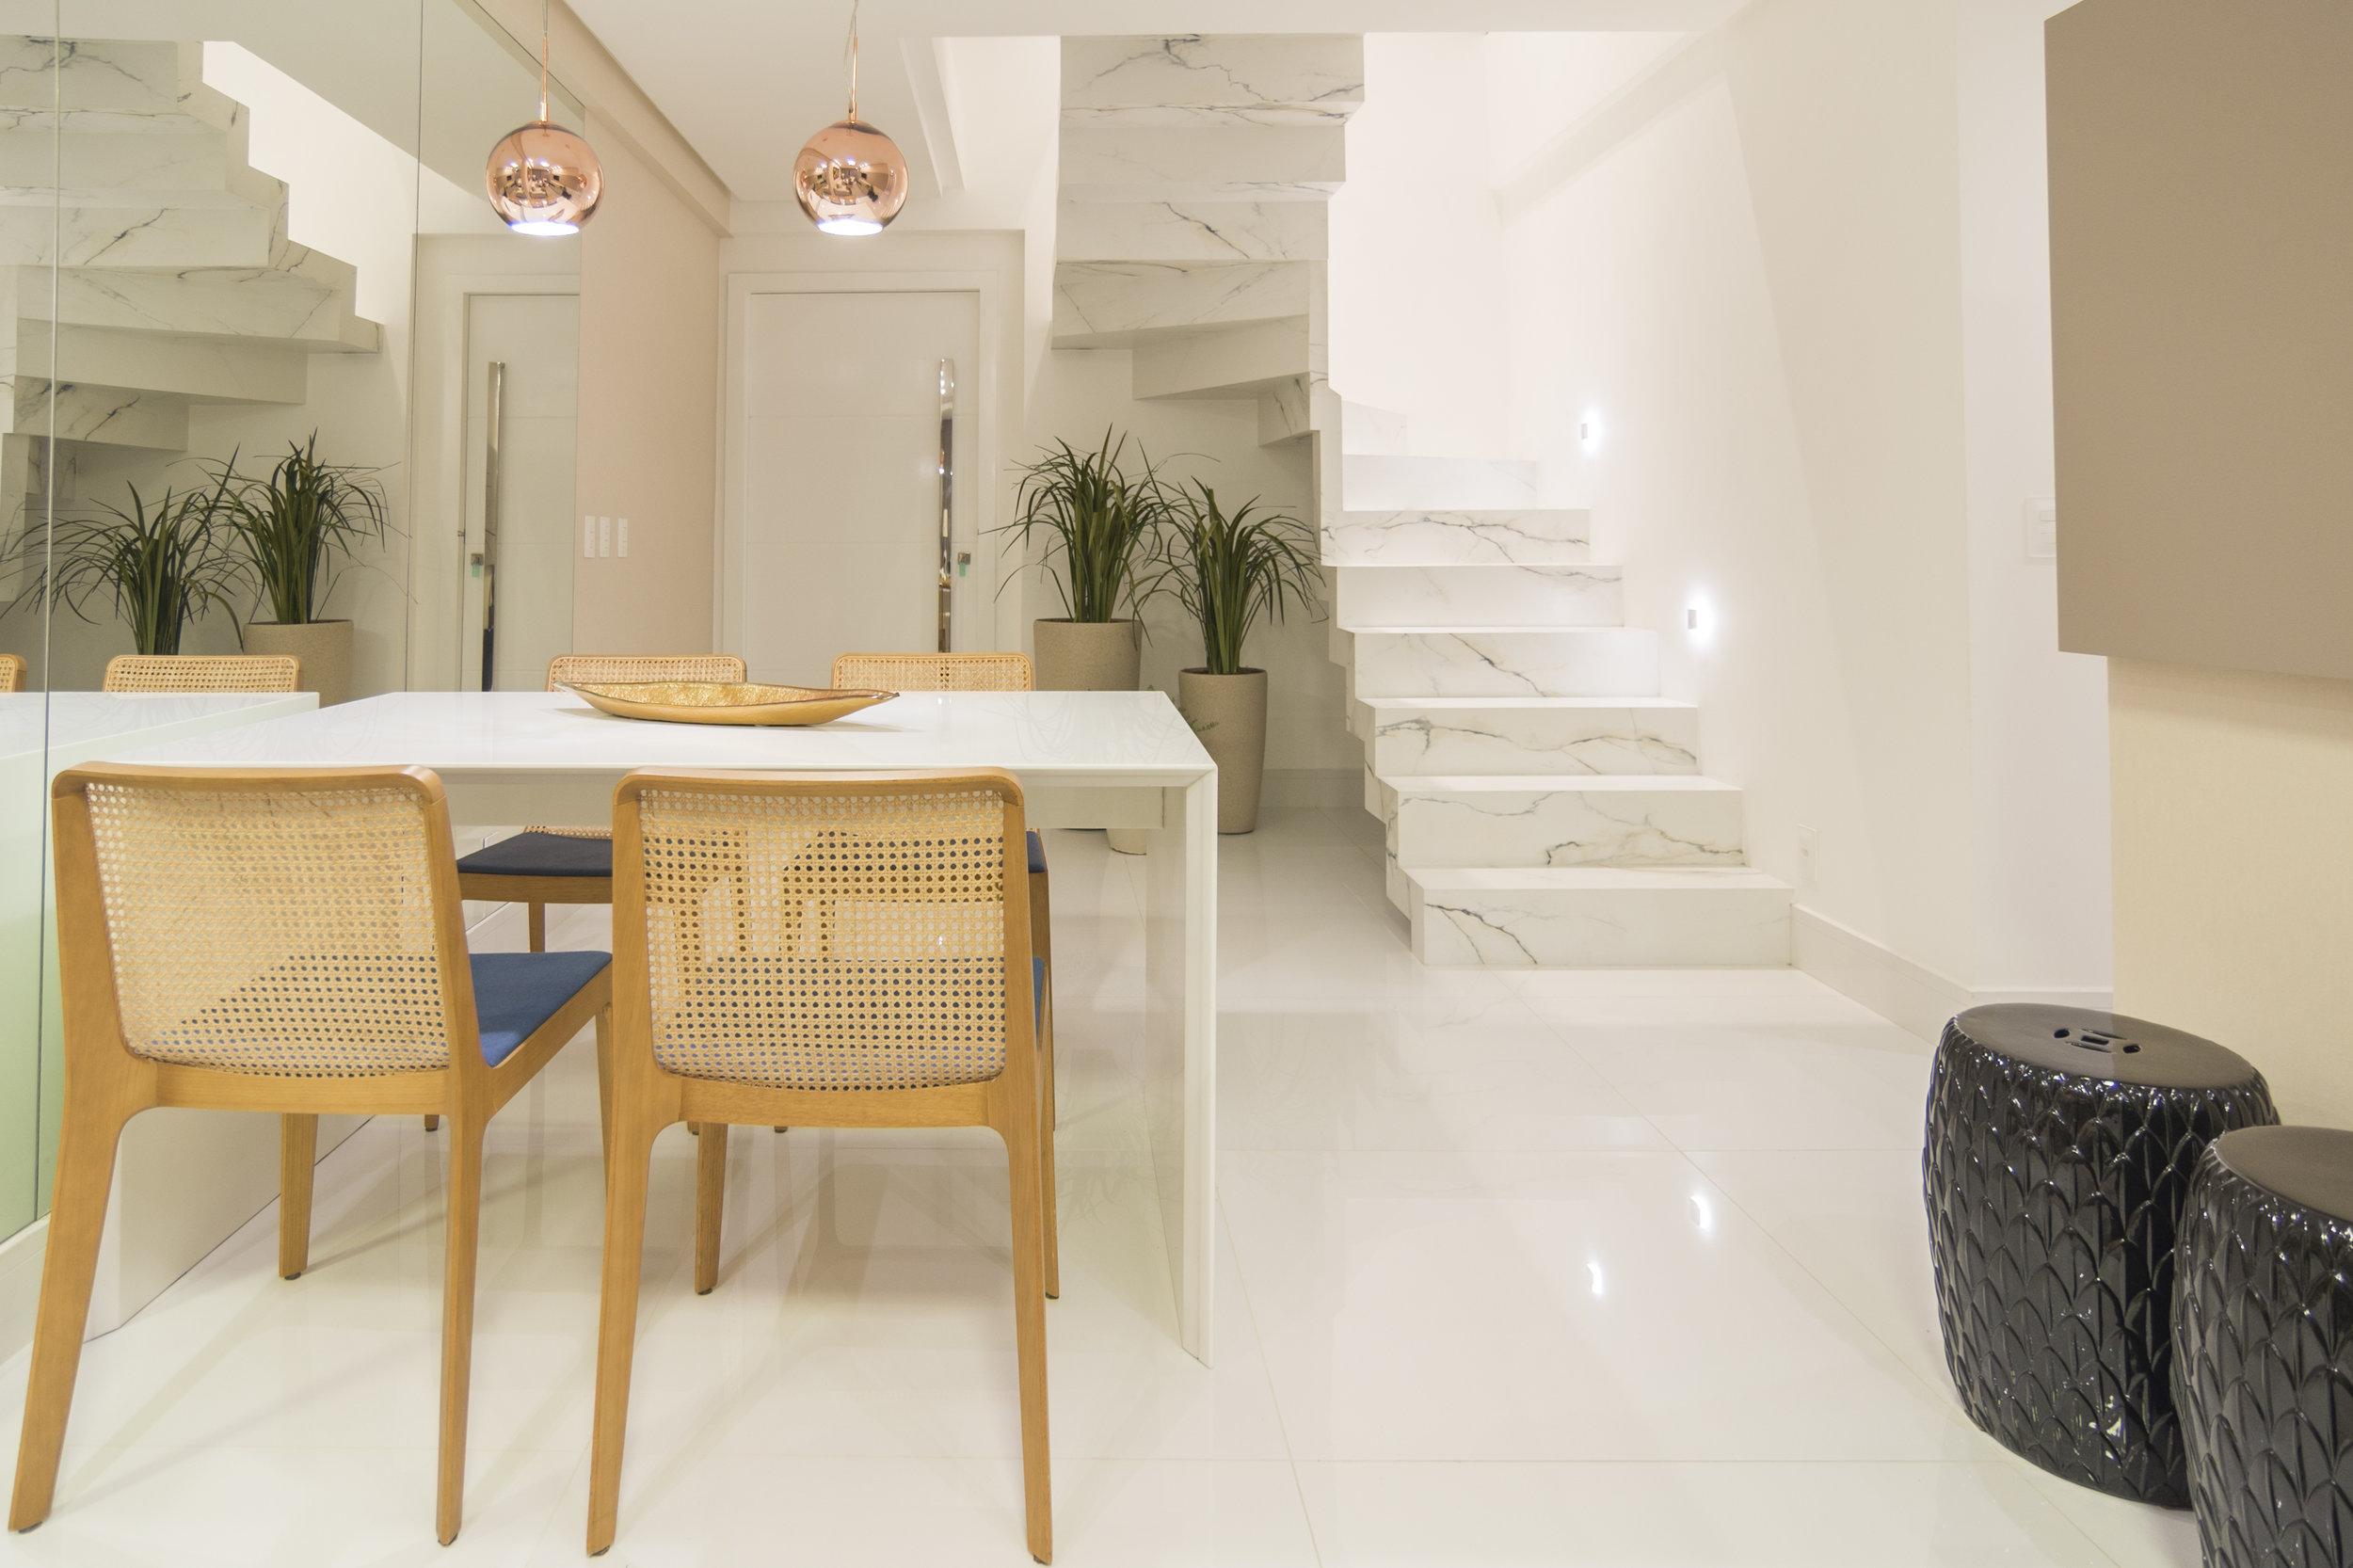 projeto-arquitetonico-robertoindira-duo-arquitetura-apartamentos-estar-08.jpg